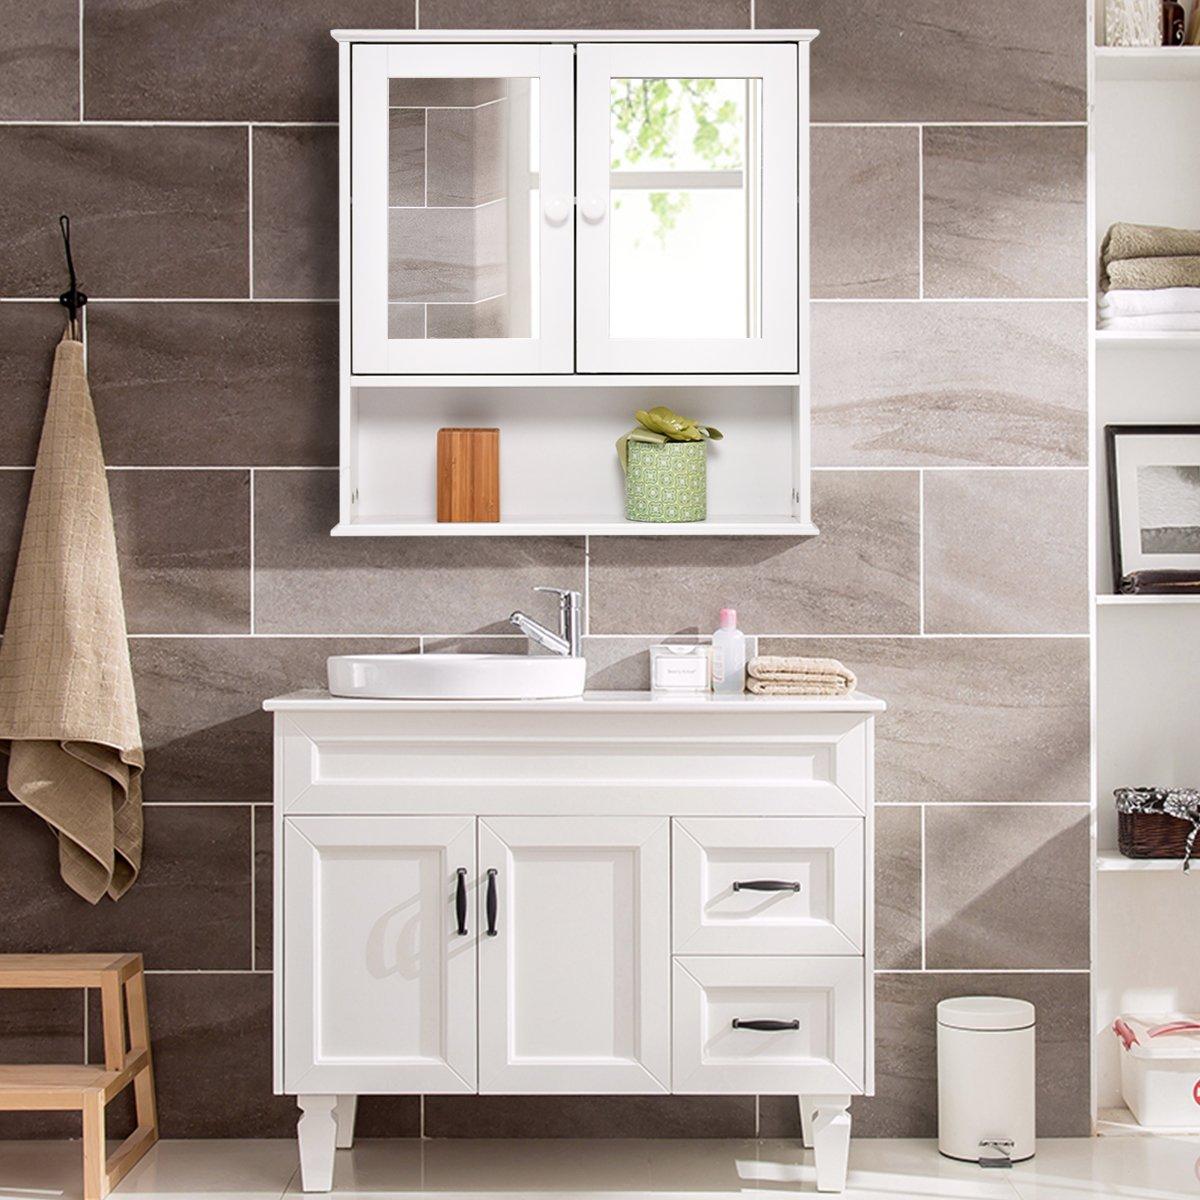 Amazon.com: TANGKULA Bathroom Cabinet Double Mirror Door Wall Mount ...